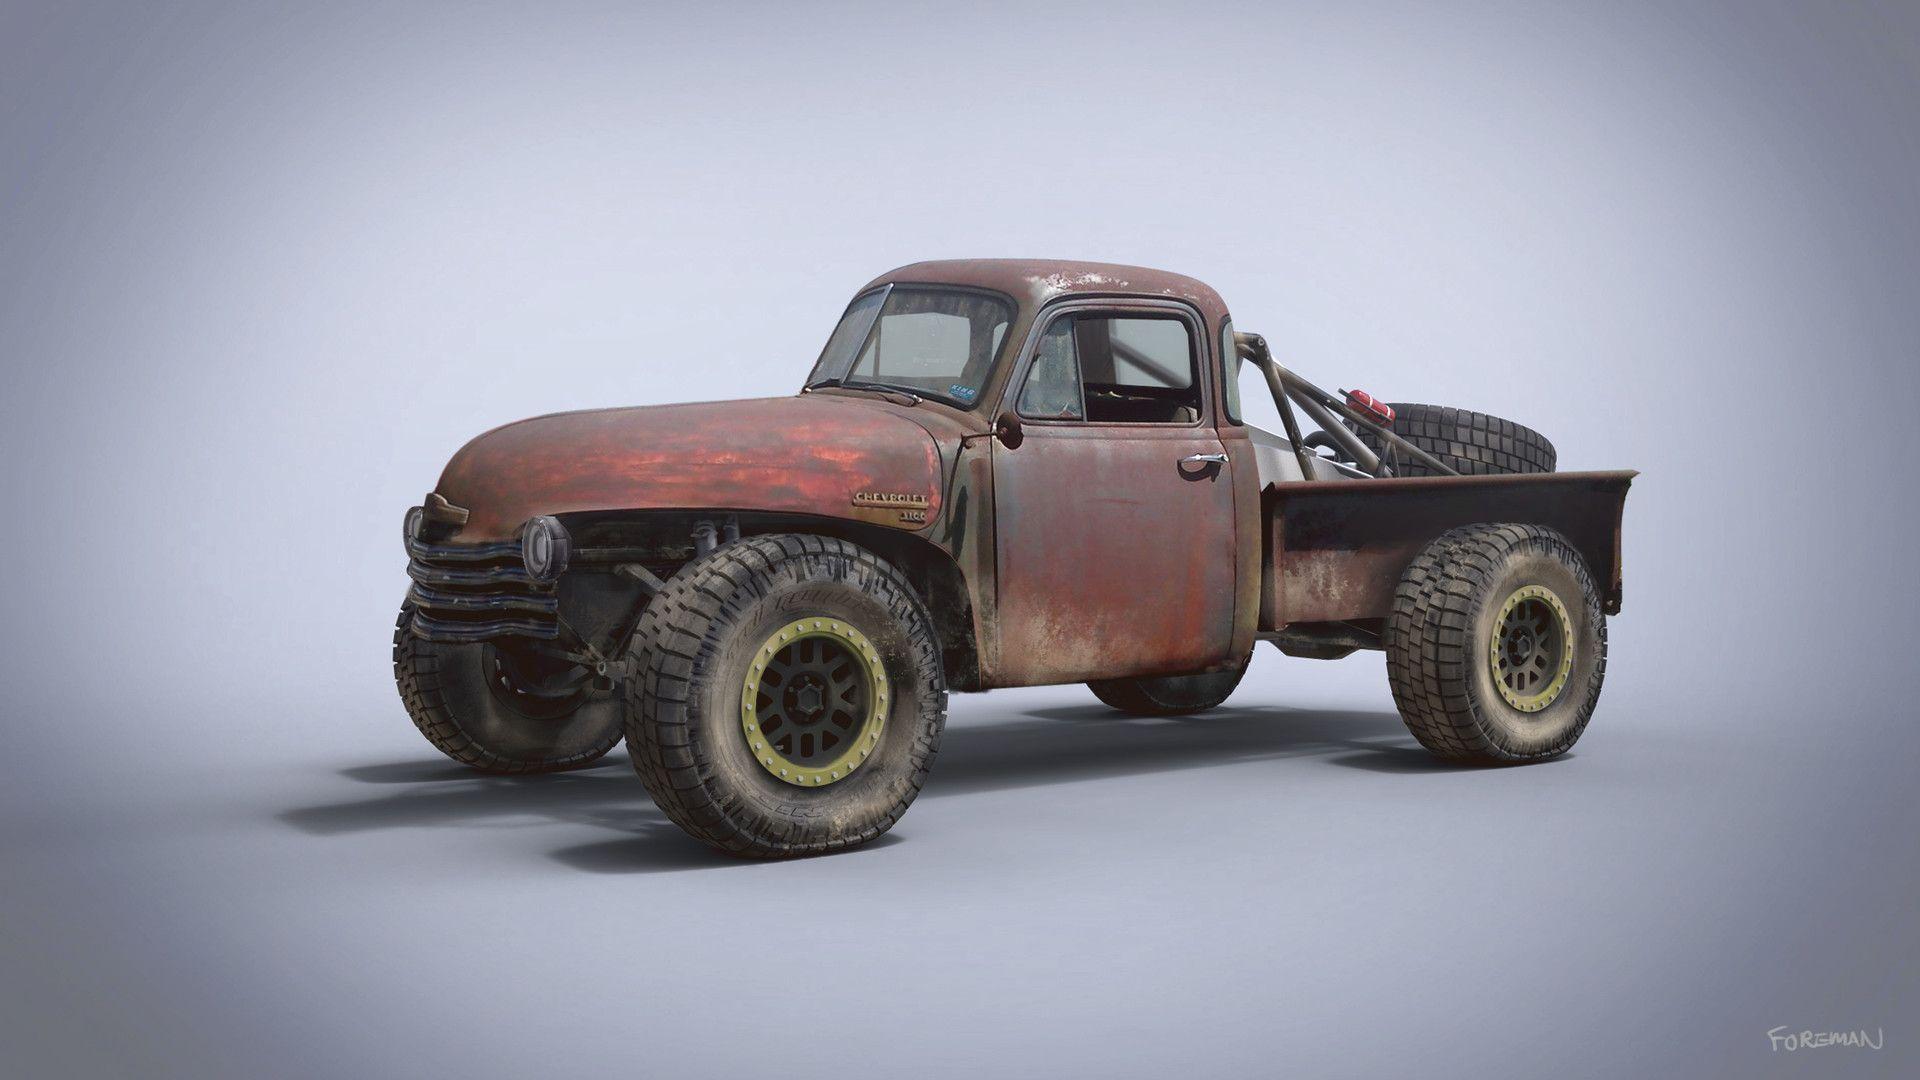 Обои sci-fi ww2 allied standard car, Matthias Develtere. Рендеринг foto 8